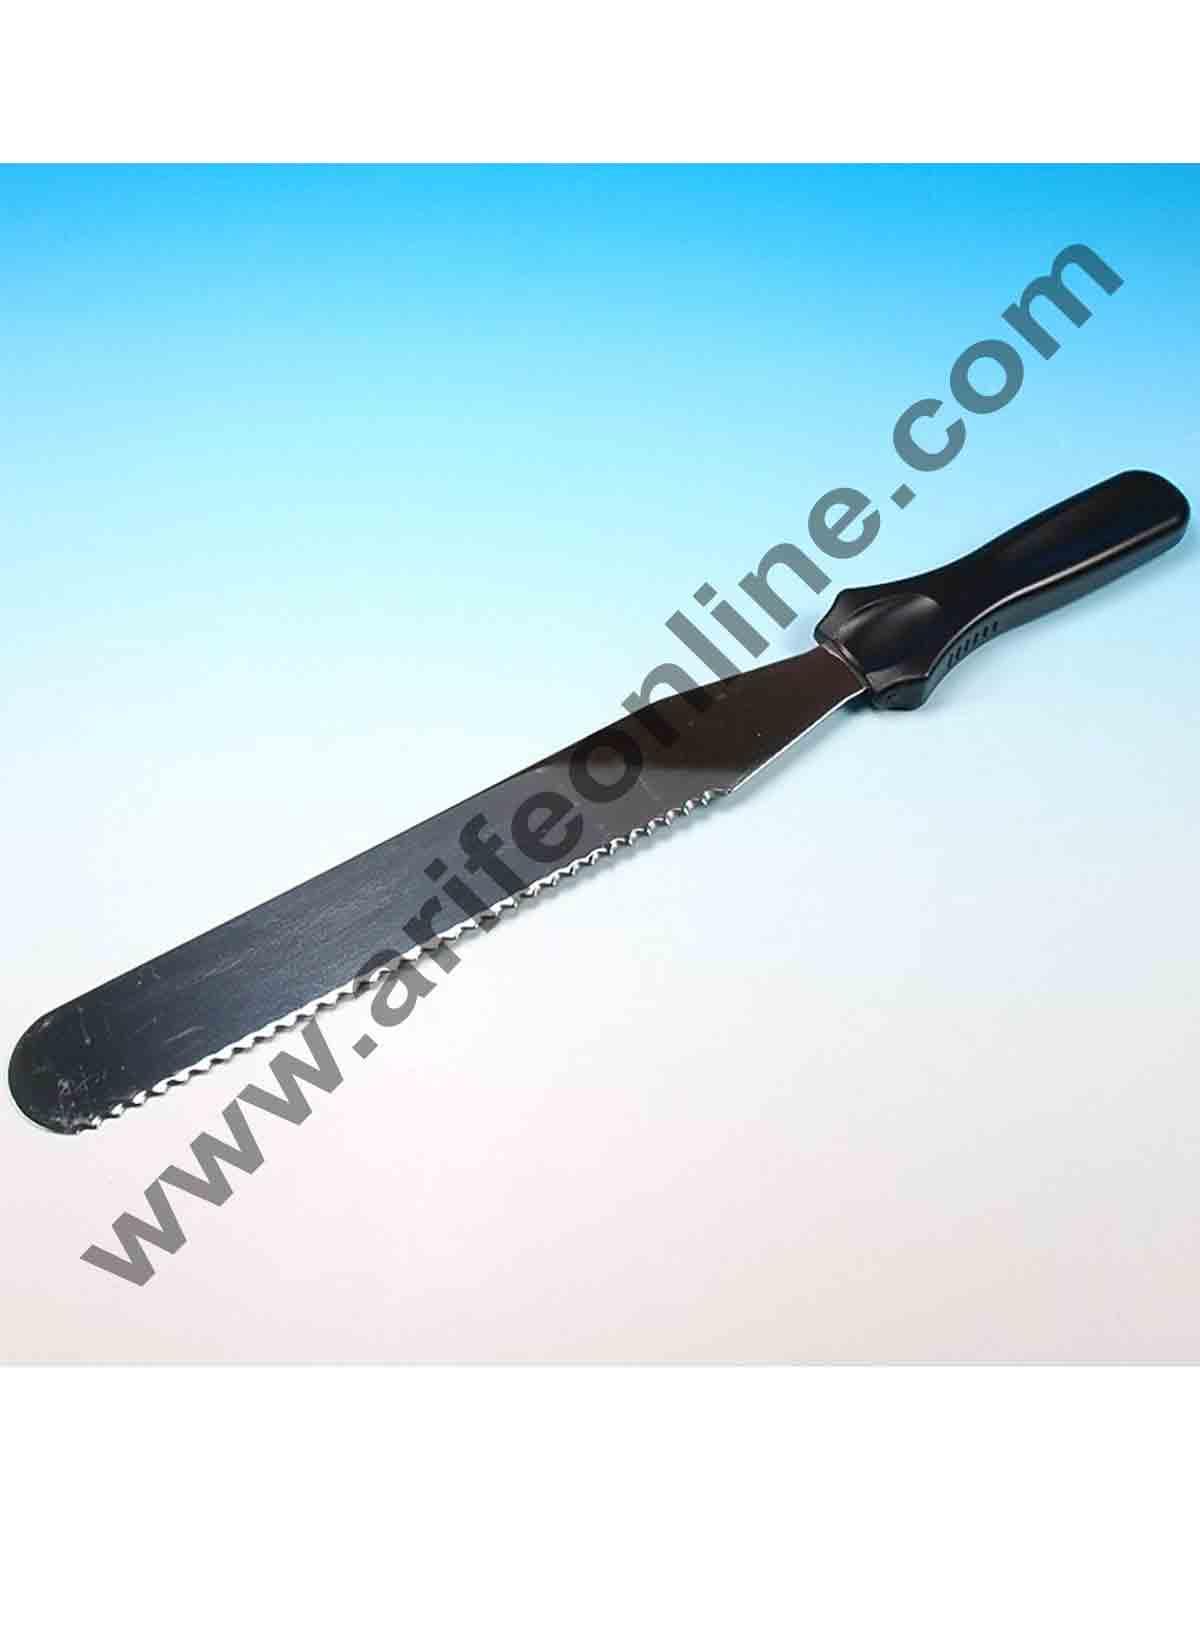 Cake Decor Straight Spatula Serrated Knife,Combo Cake Pallate Knife